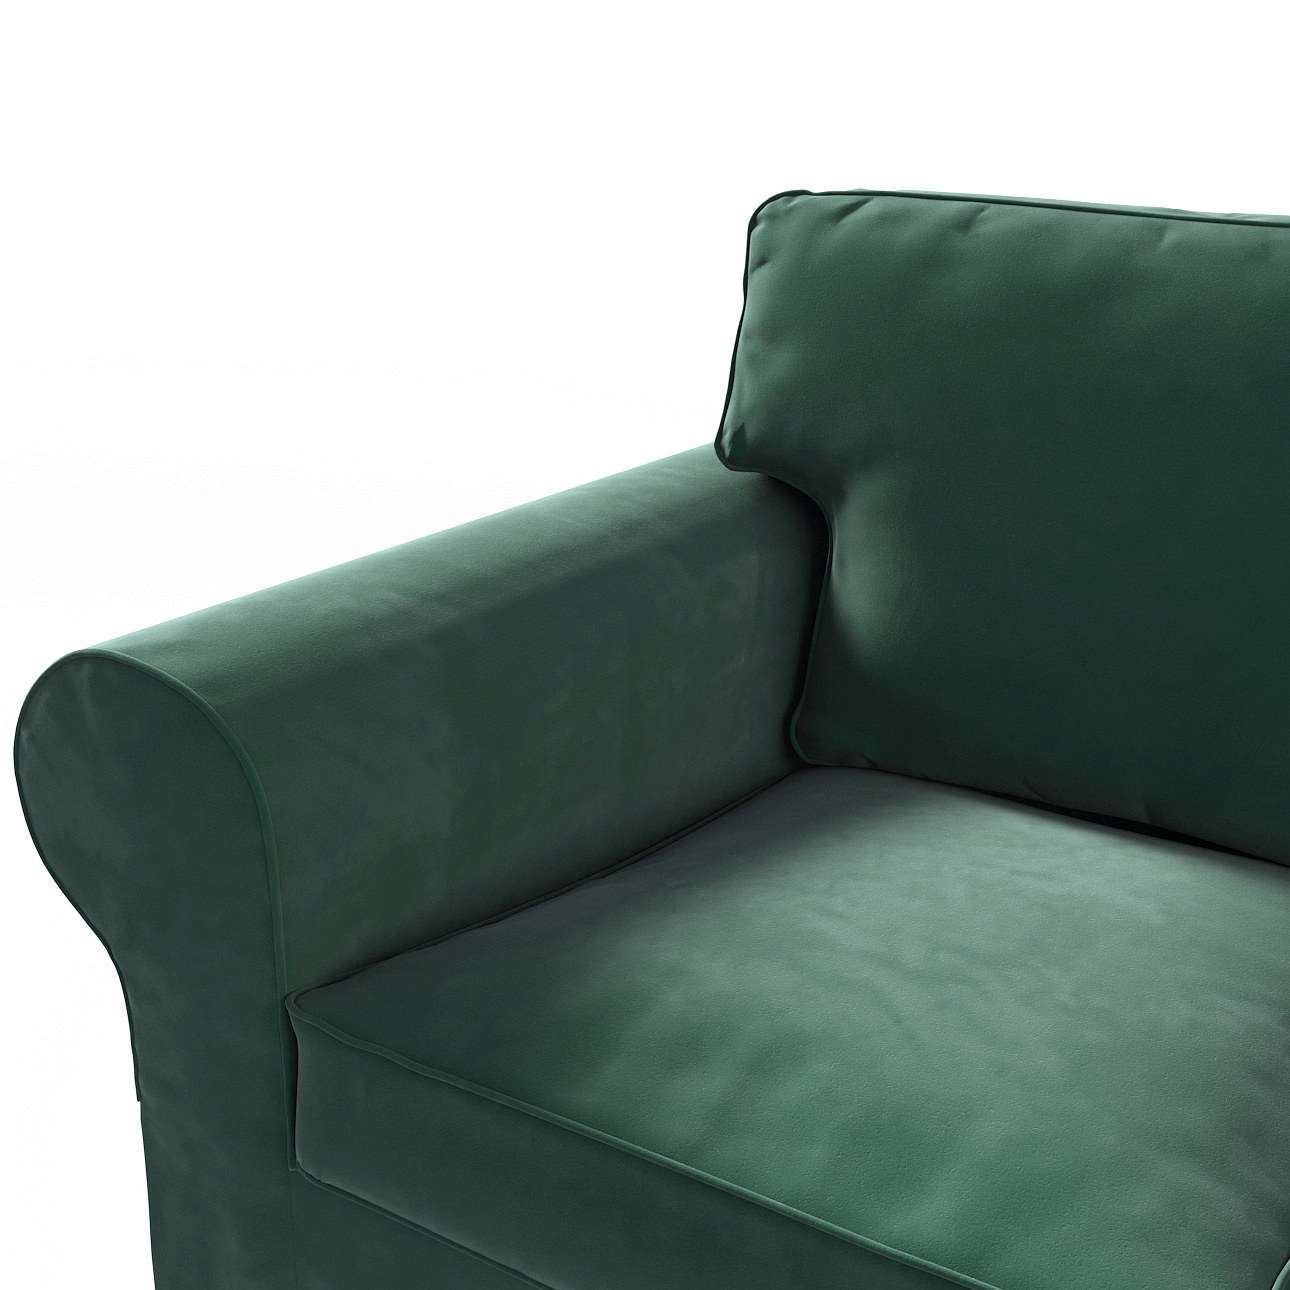 ektorp velvet dunkelgr n ektorp 3 sitzer sofabezug nicht ausklappbar. Black Bedroom Furniture Sets. Home Design Ideas